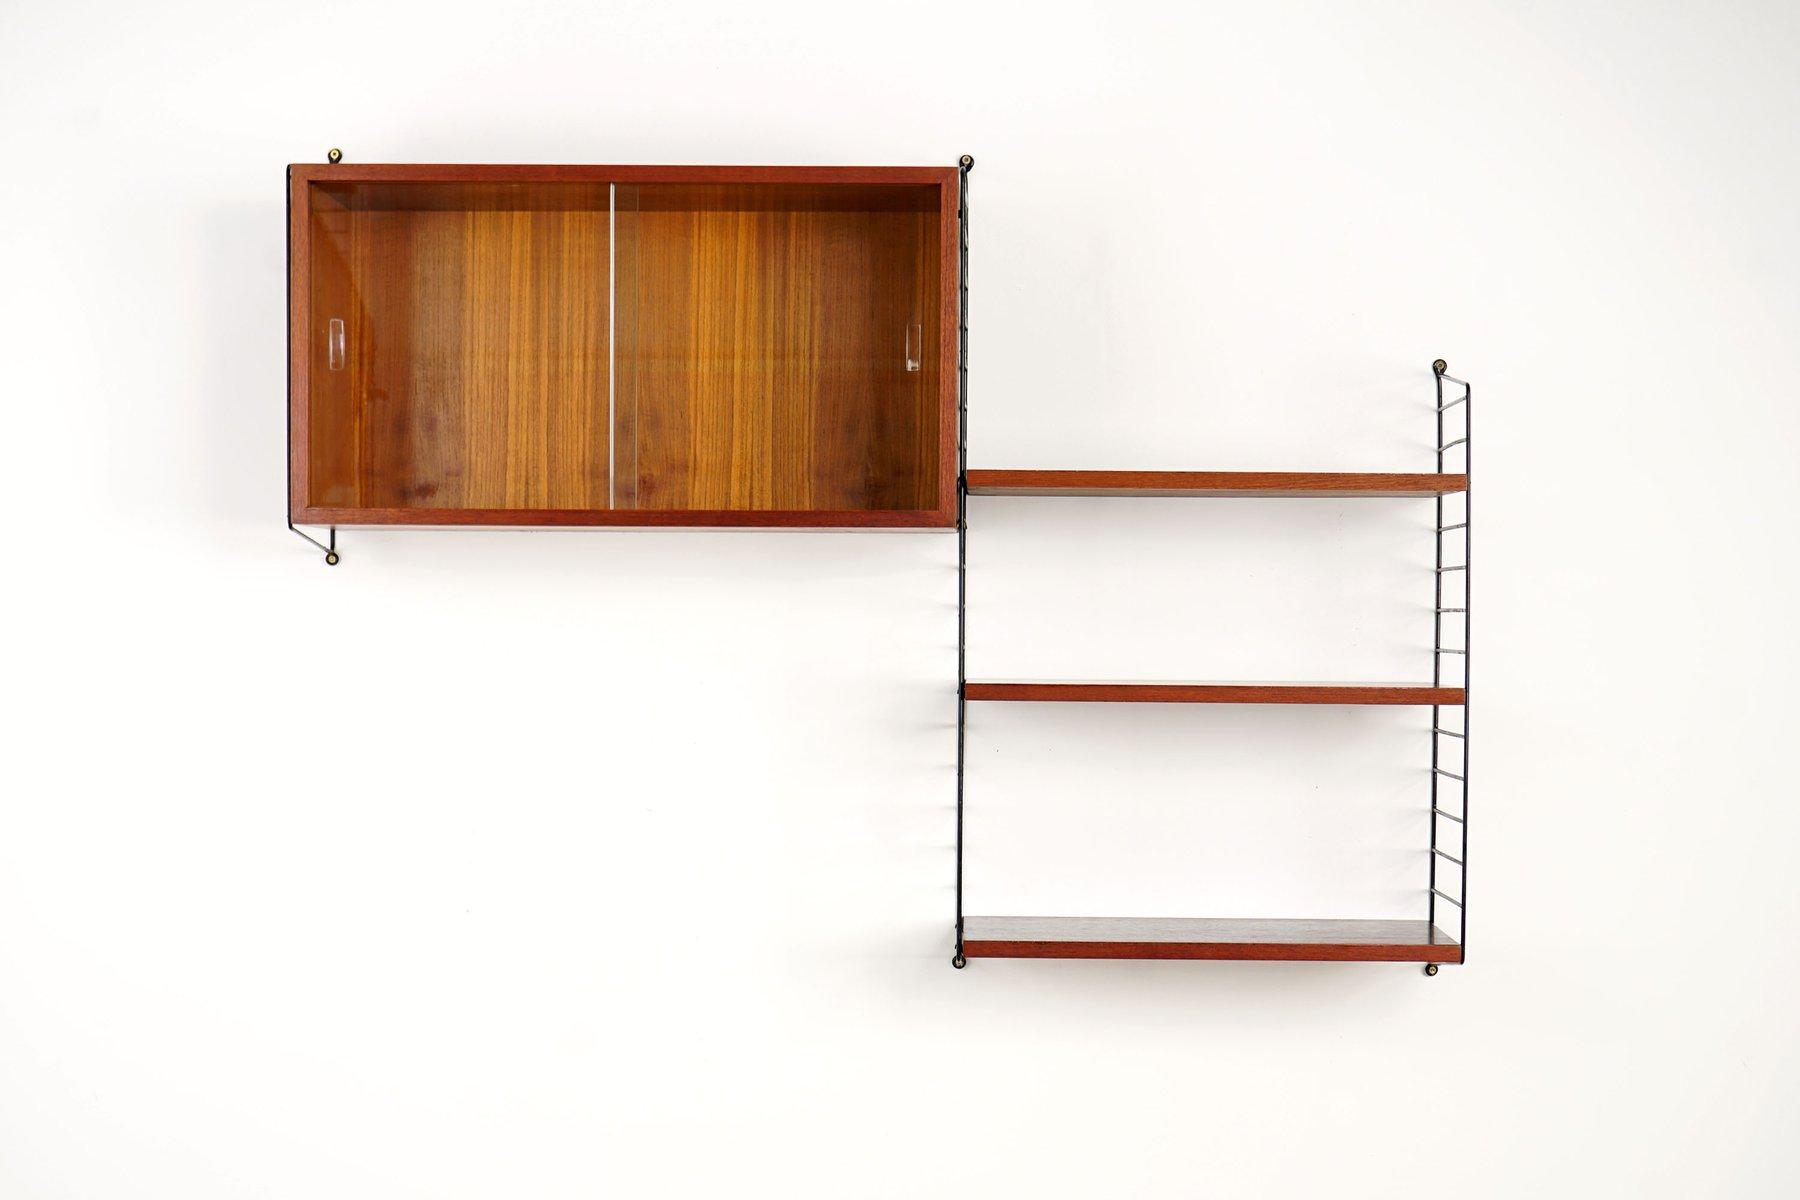 Shelving System By Kajsa & Nisse Strinning For String, 1950S